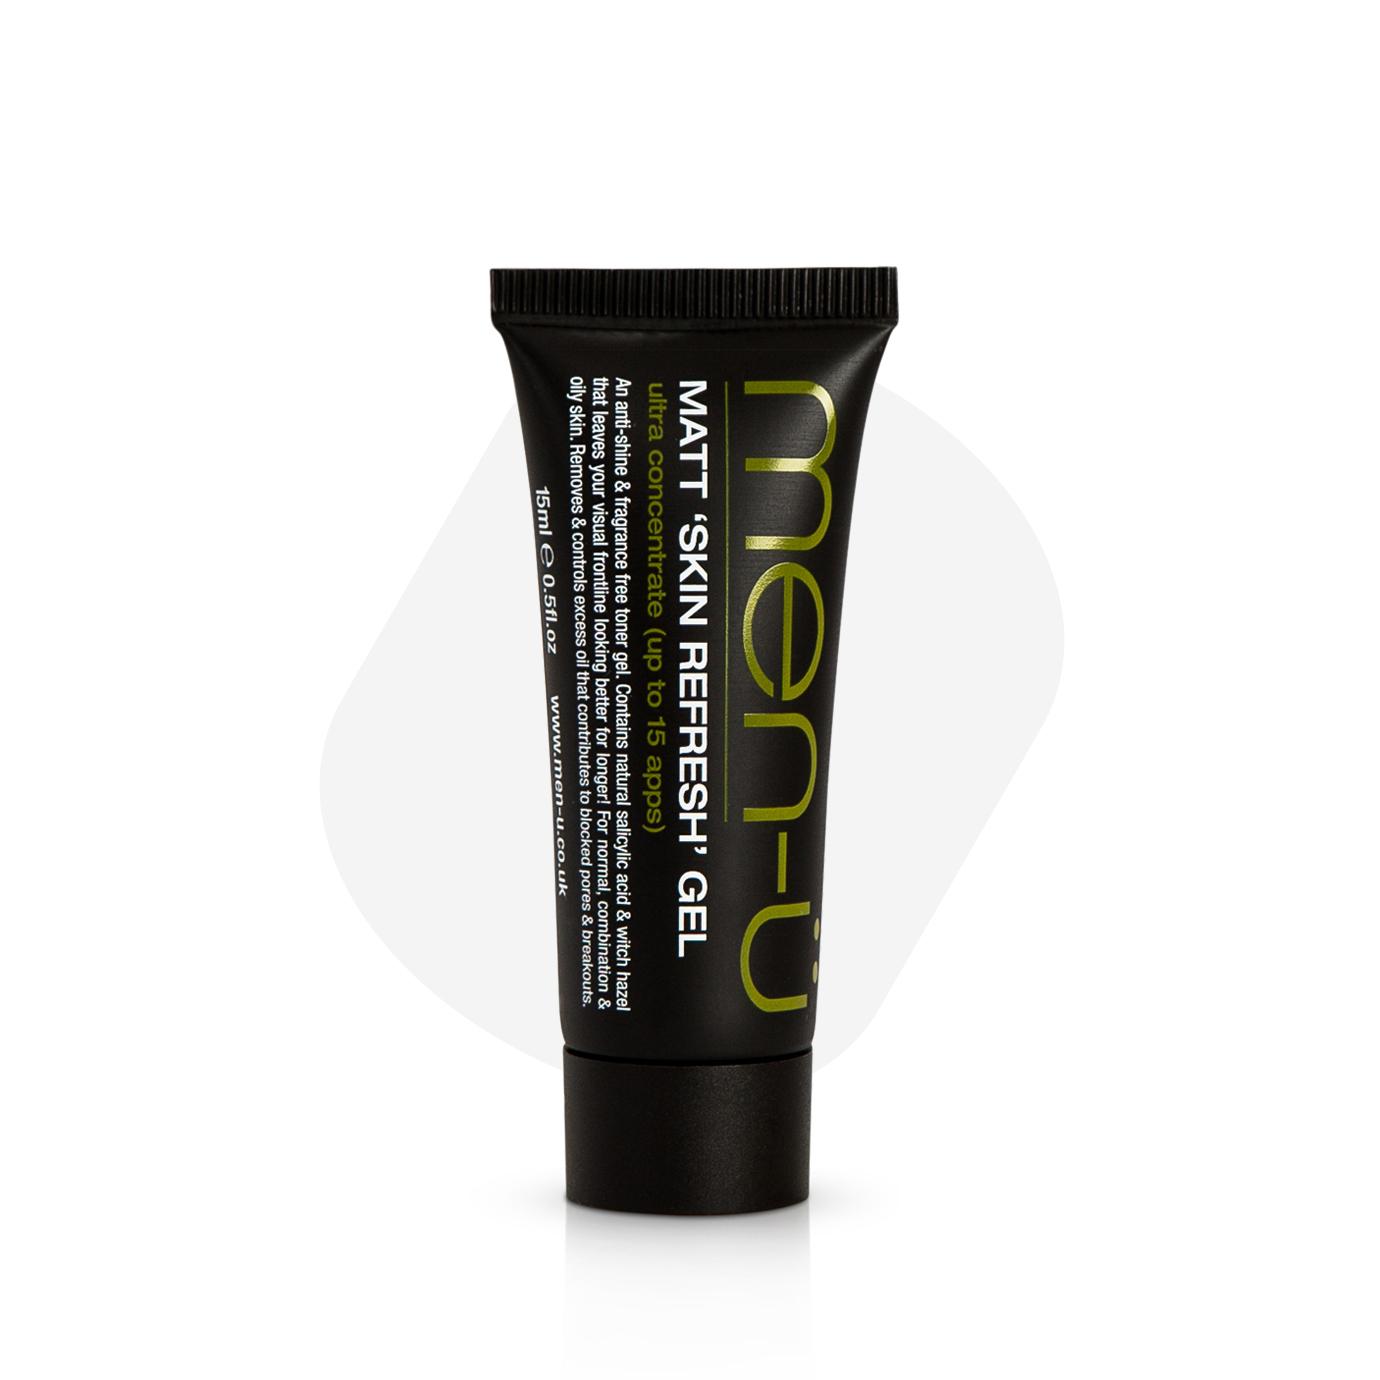 Matt 'Skin Refresh' Gel buddy tube 15ml